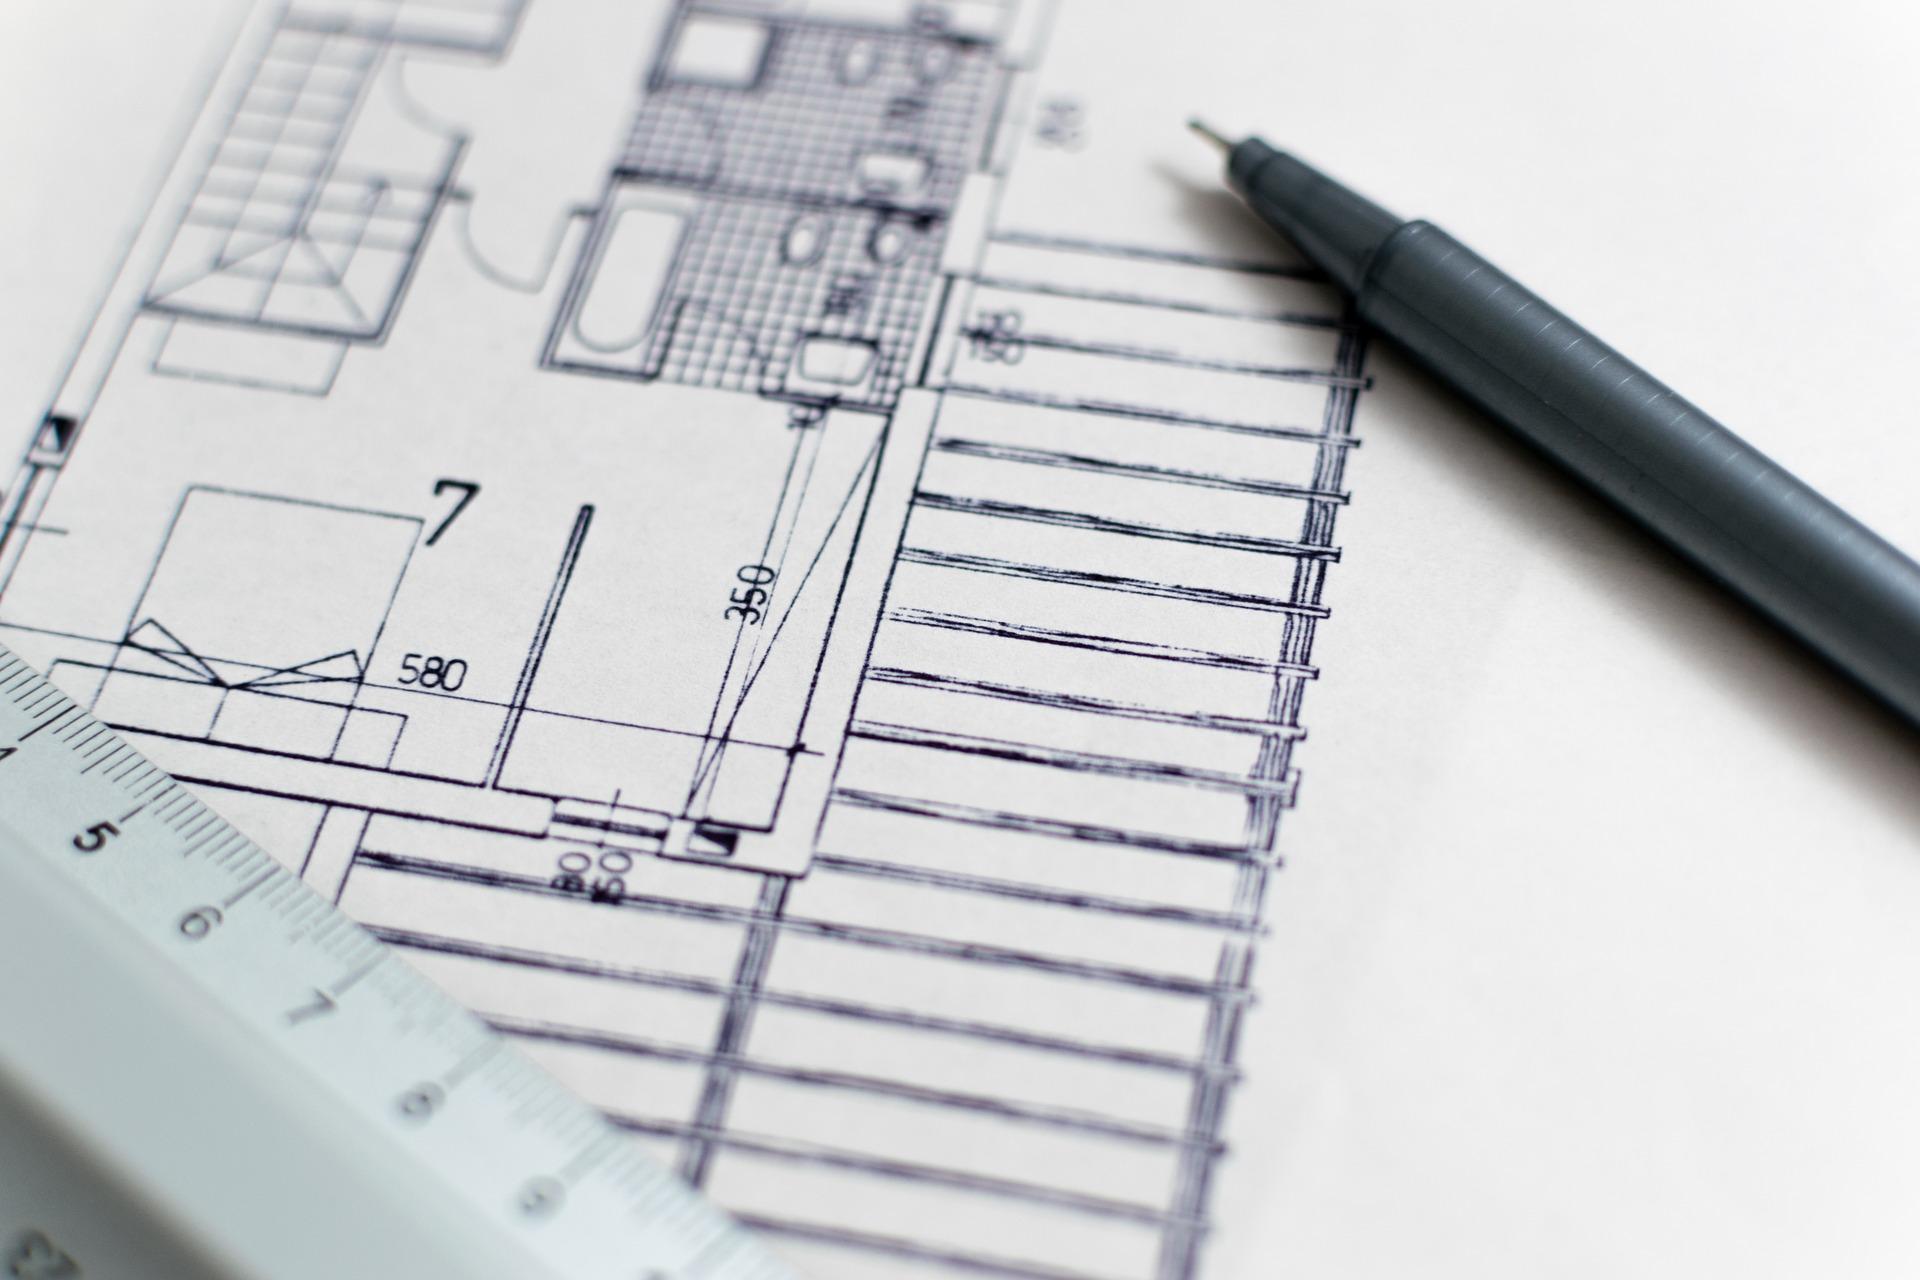 Andreas Kalus Architekt Dipl.-Ing. FH, Betriebswirt